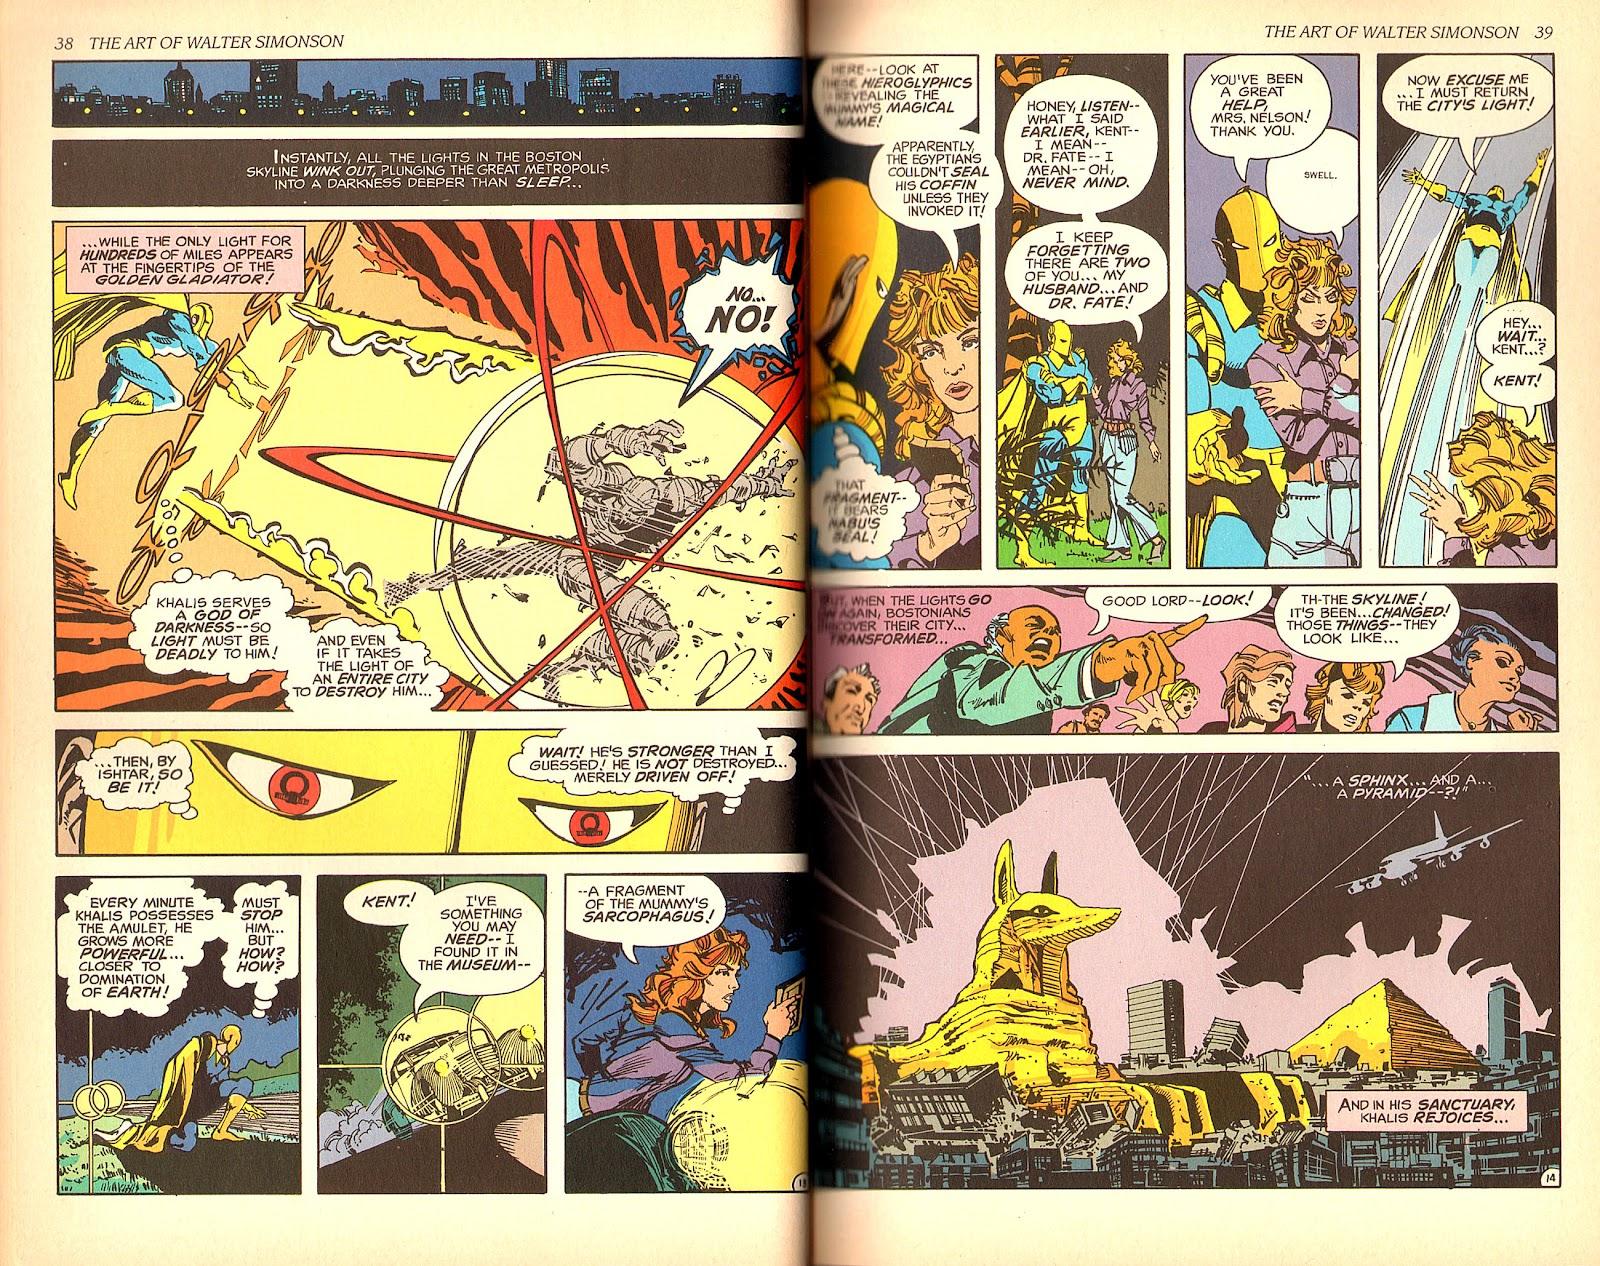 Read online The Art of Walter Simonson comic -  Issue # TPB - 21